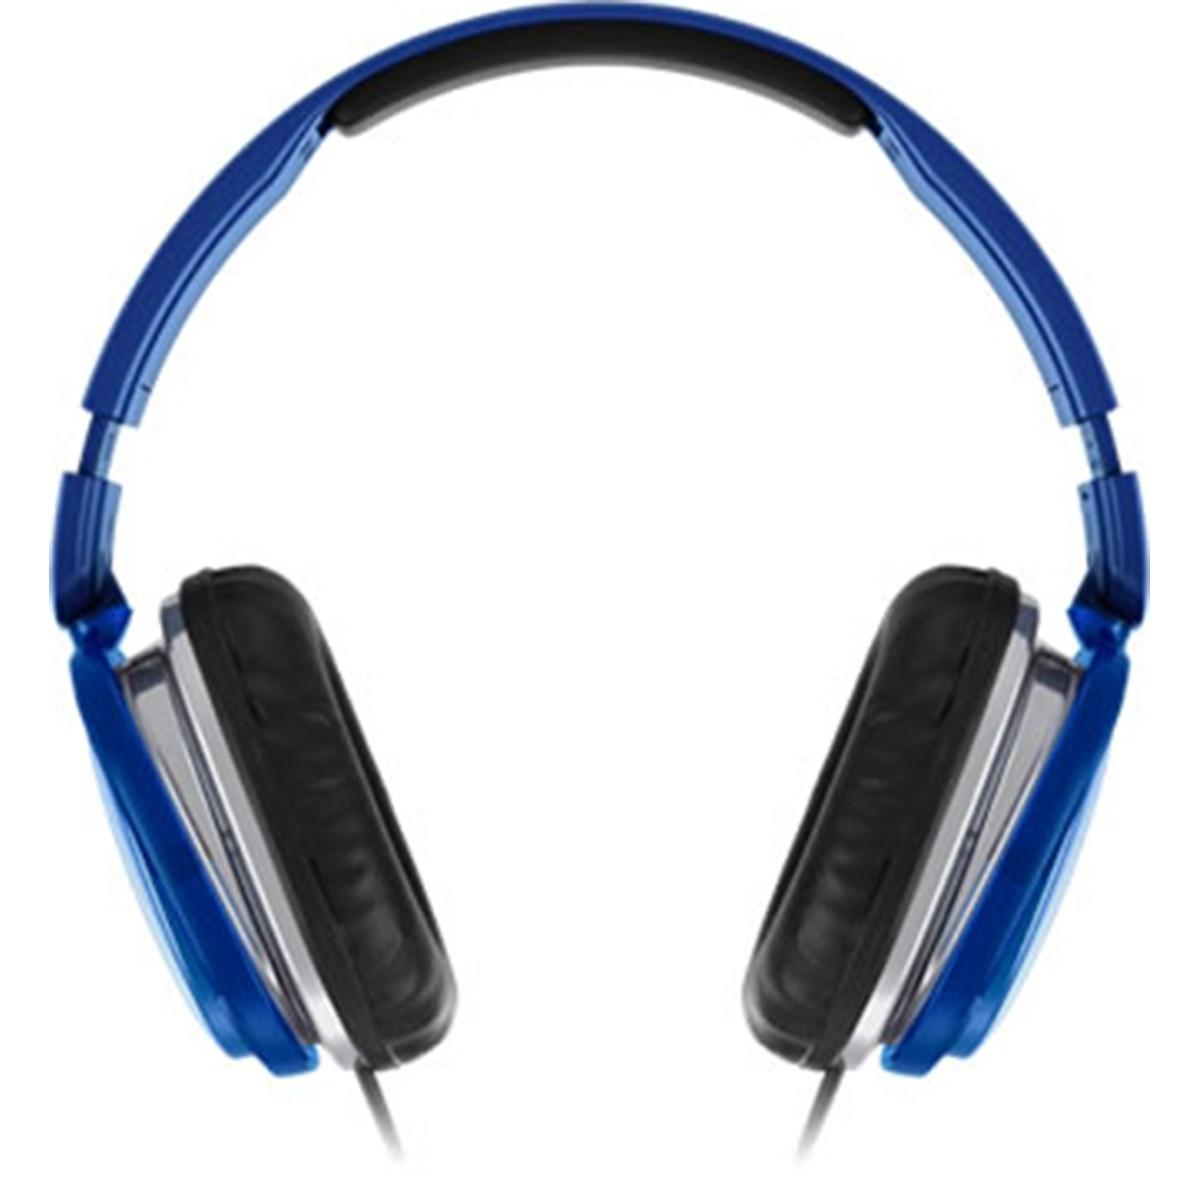 Panasonic RP-HX350M Fone de Ouvido Com Microfone, Azul